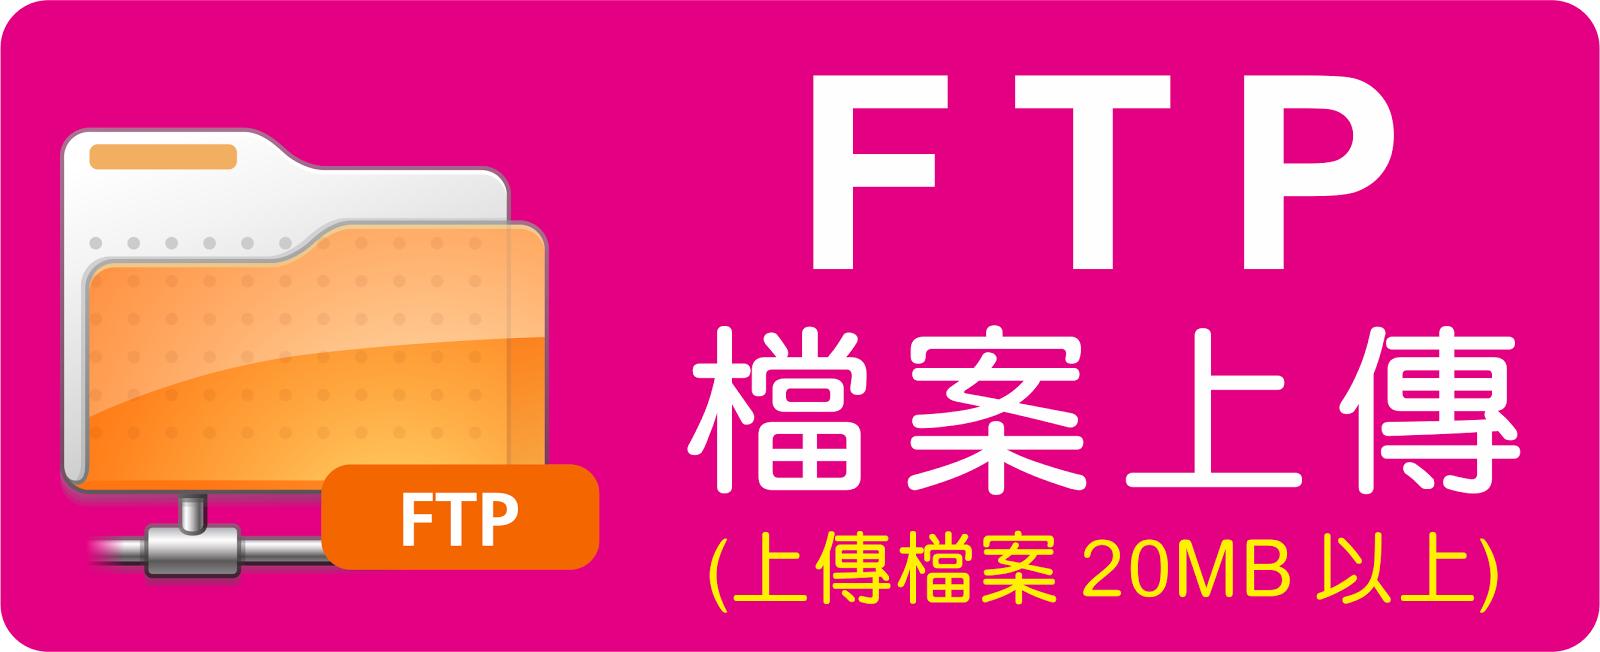 FTP - 上傳檔案